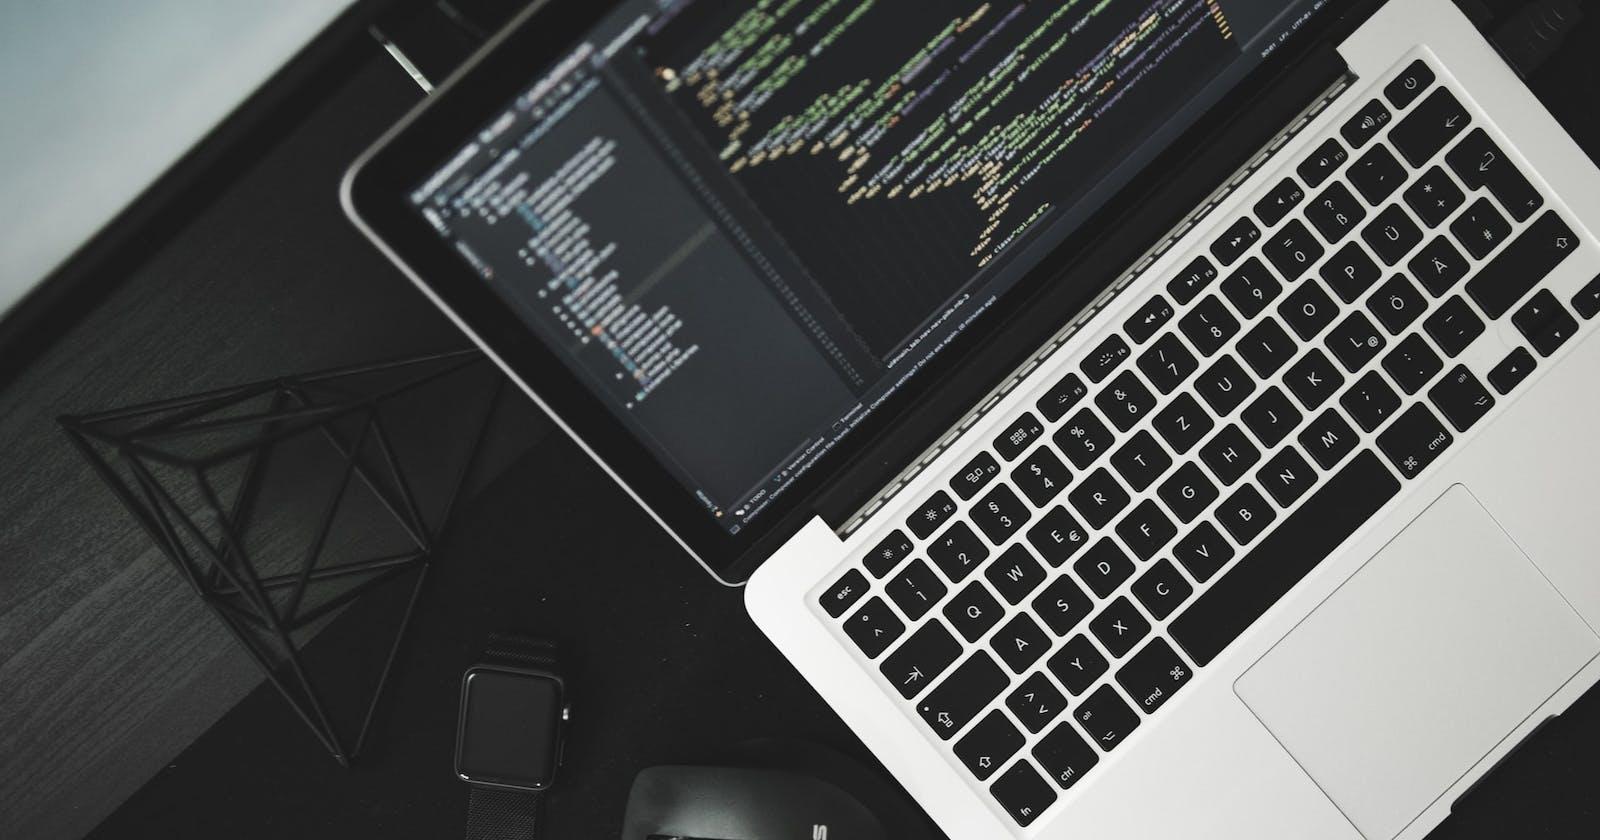 How I Save Developer's Time